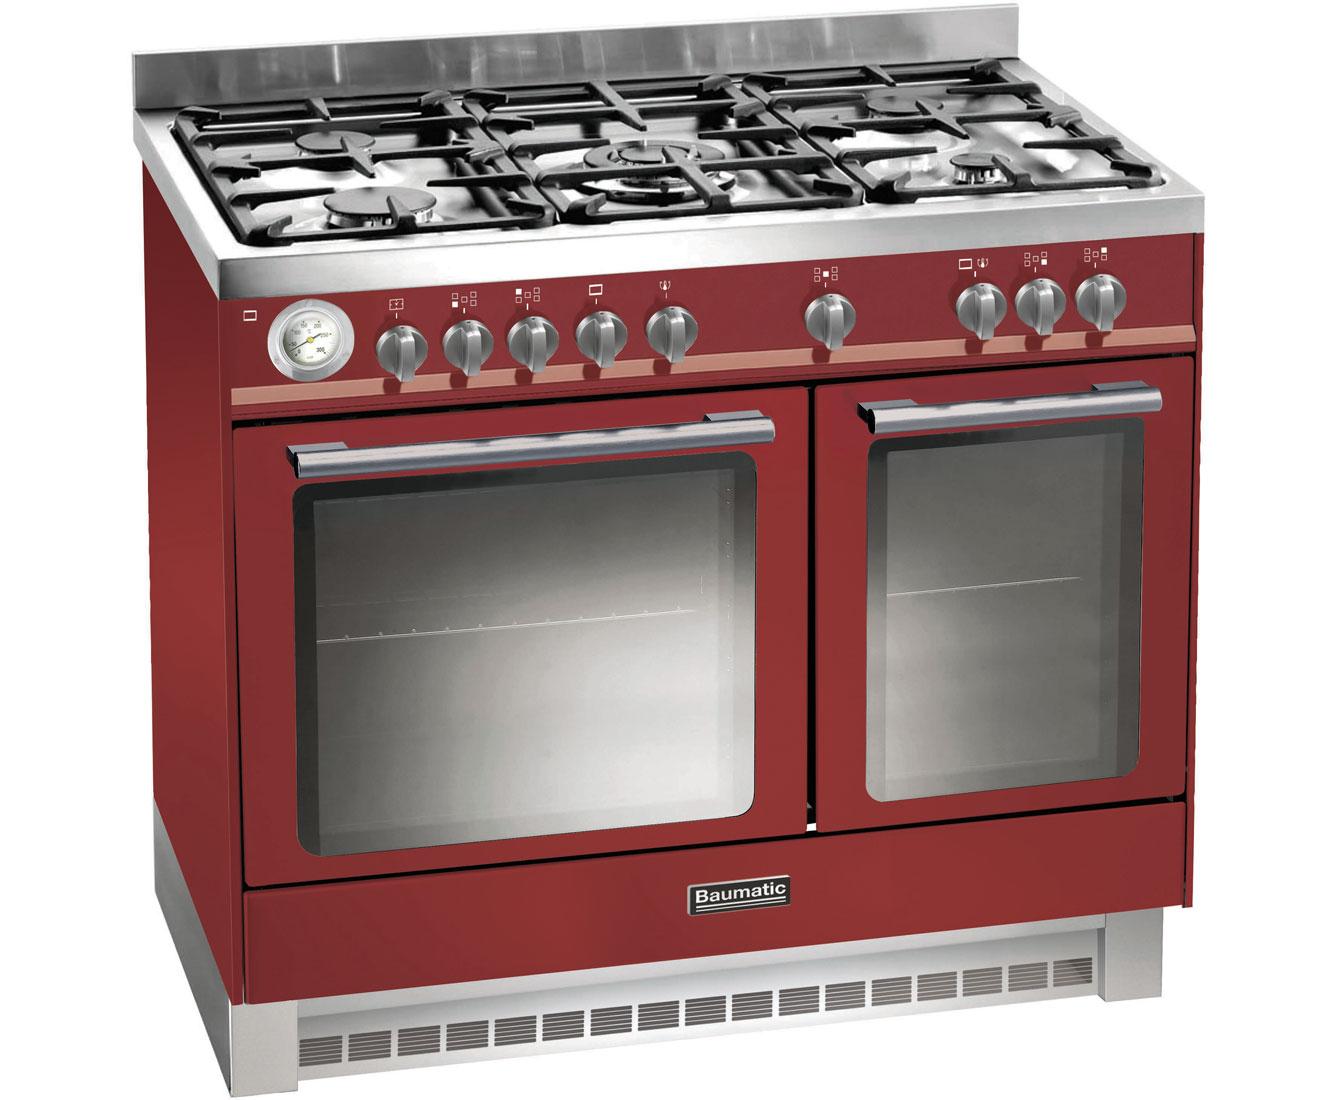 Baumatic BCD925BDY Free Standing Range Cooker in Burgundy